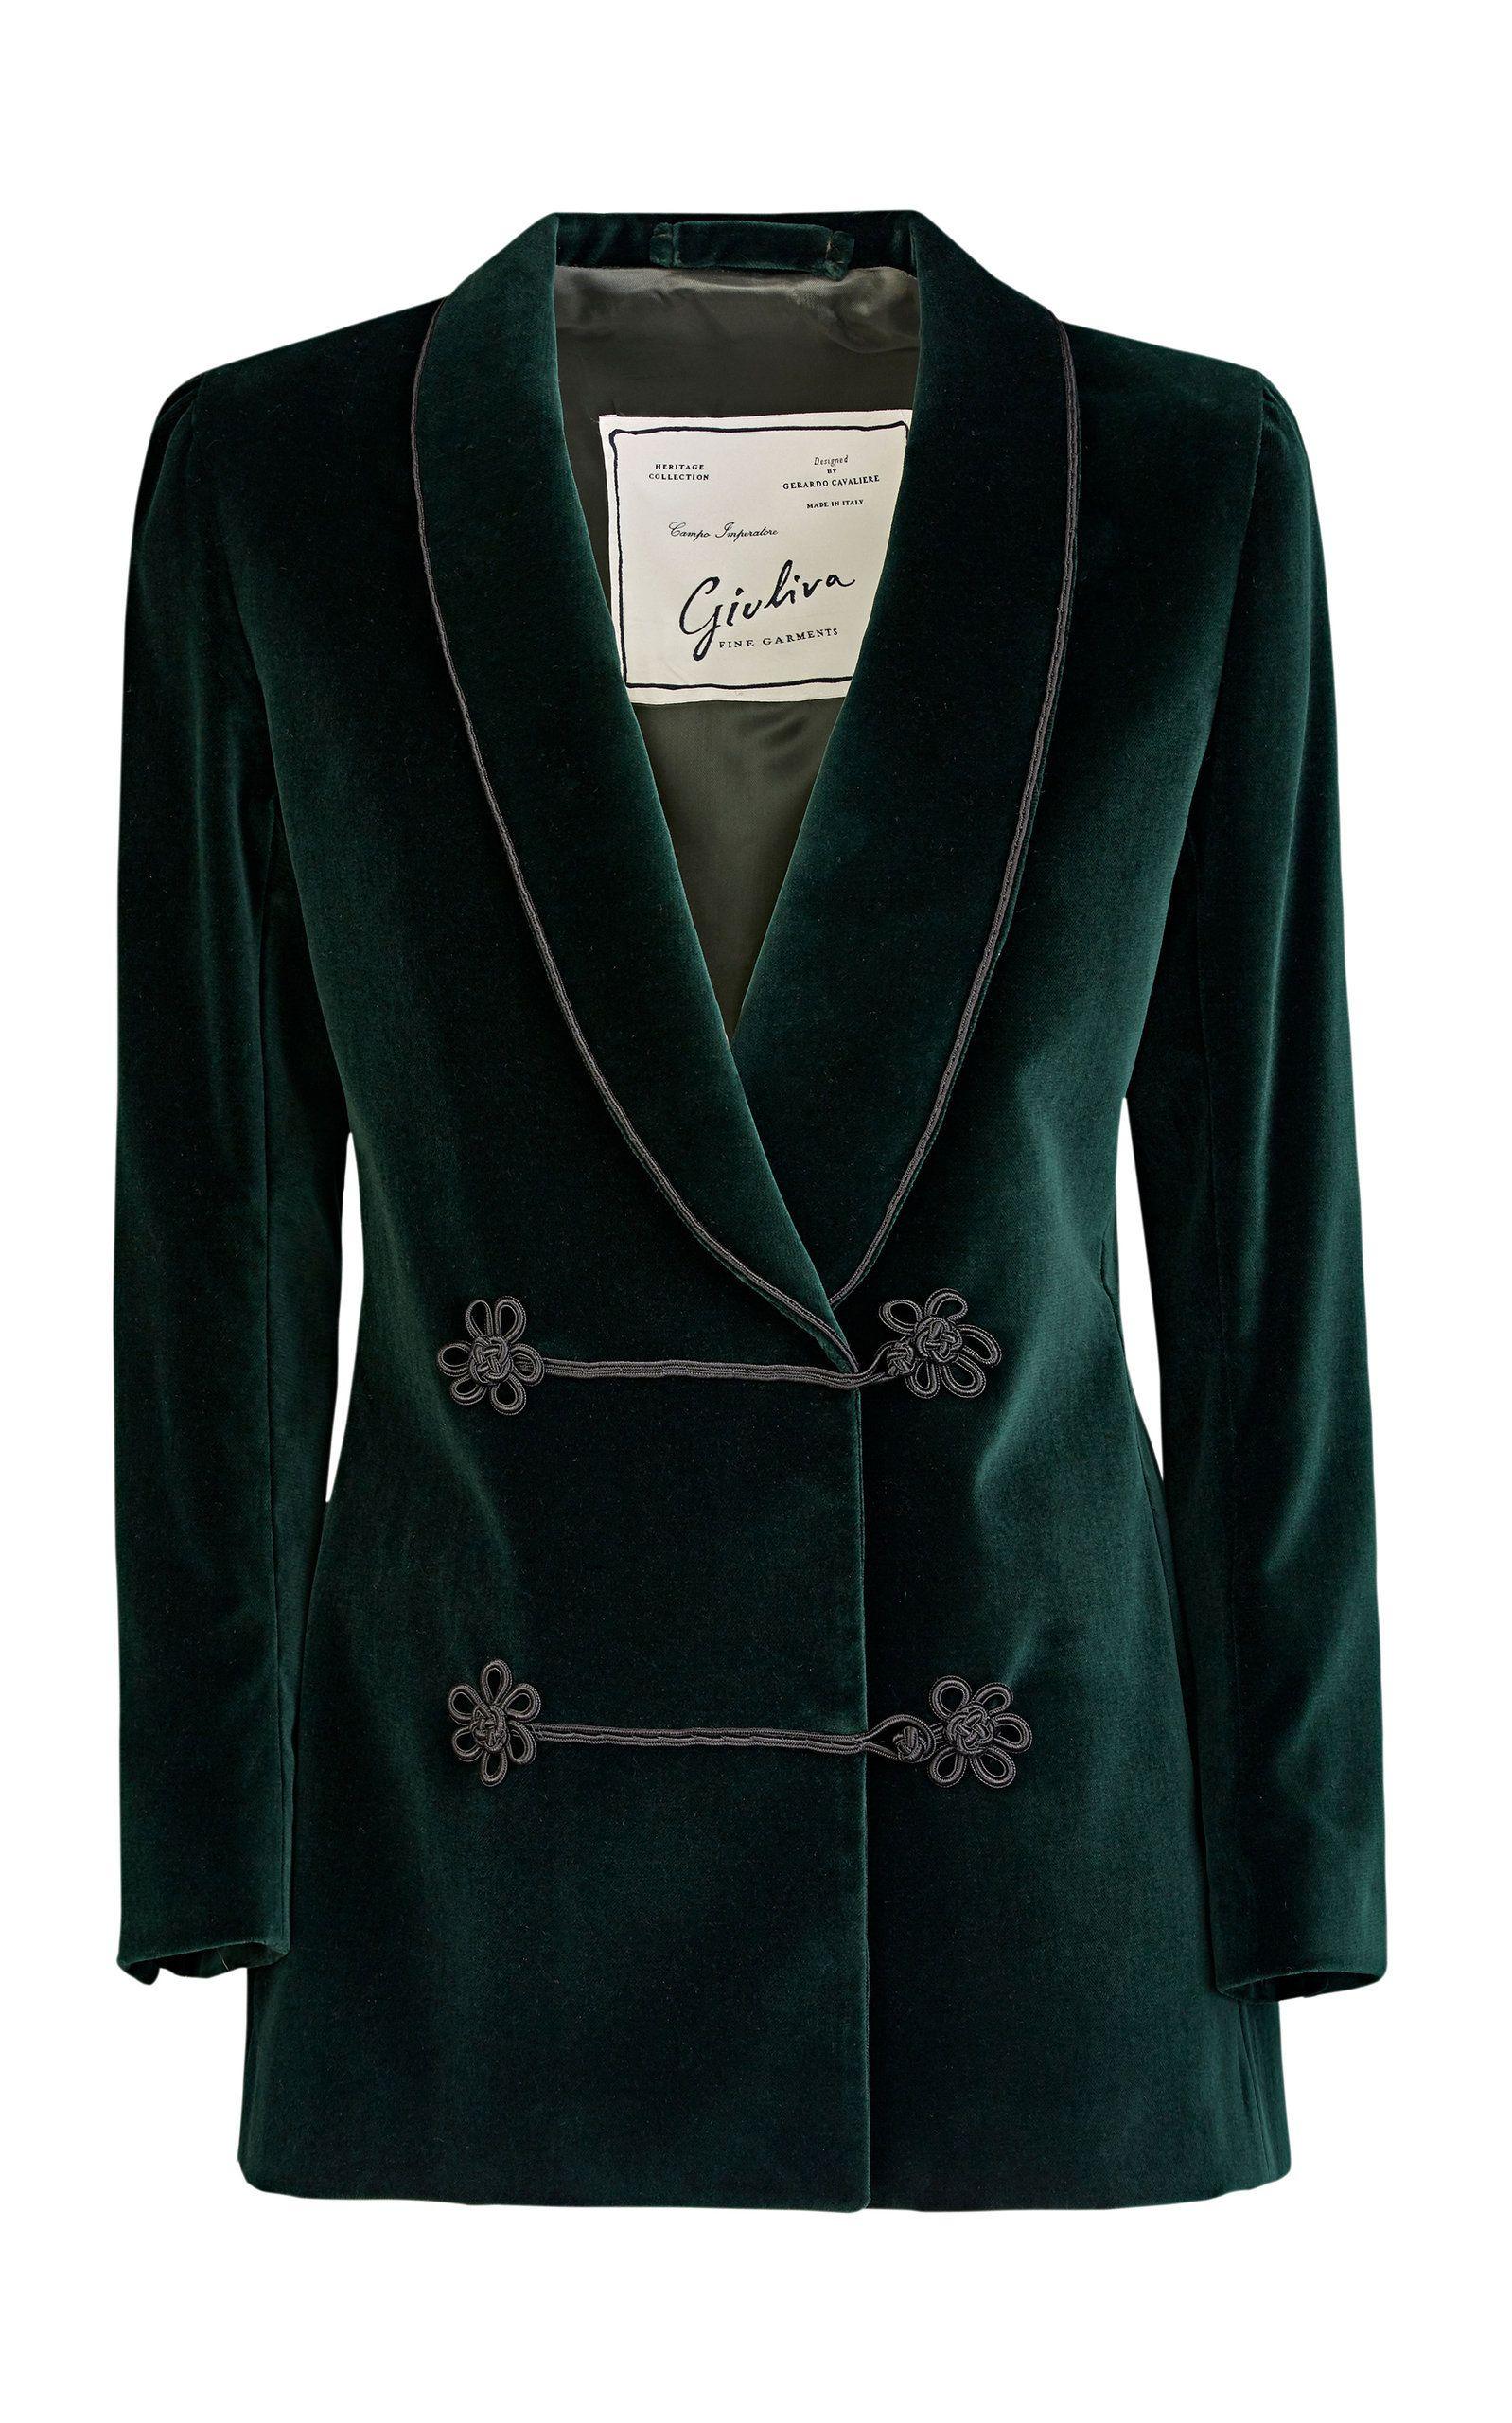 Button Jacket Claudia 2019 In Frog Velvet Breasted Dinner Double GUzSpjLMVq